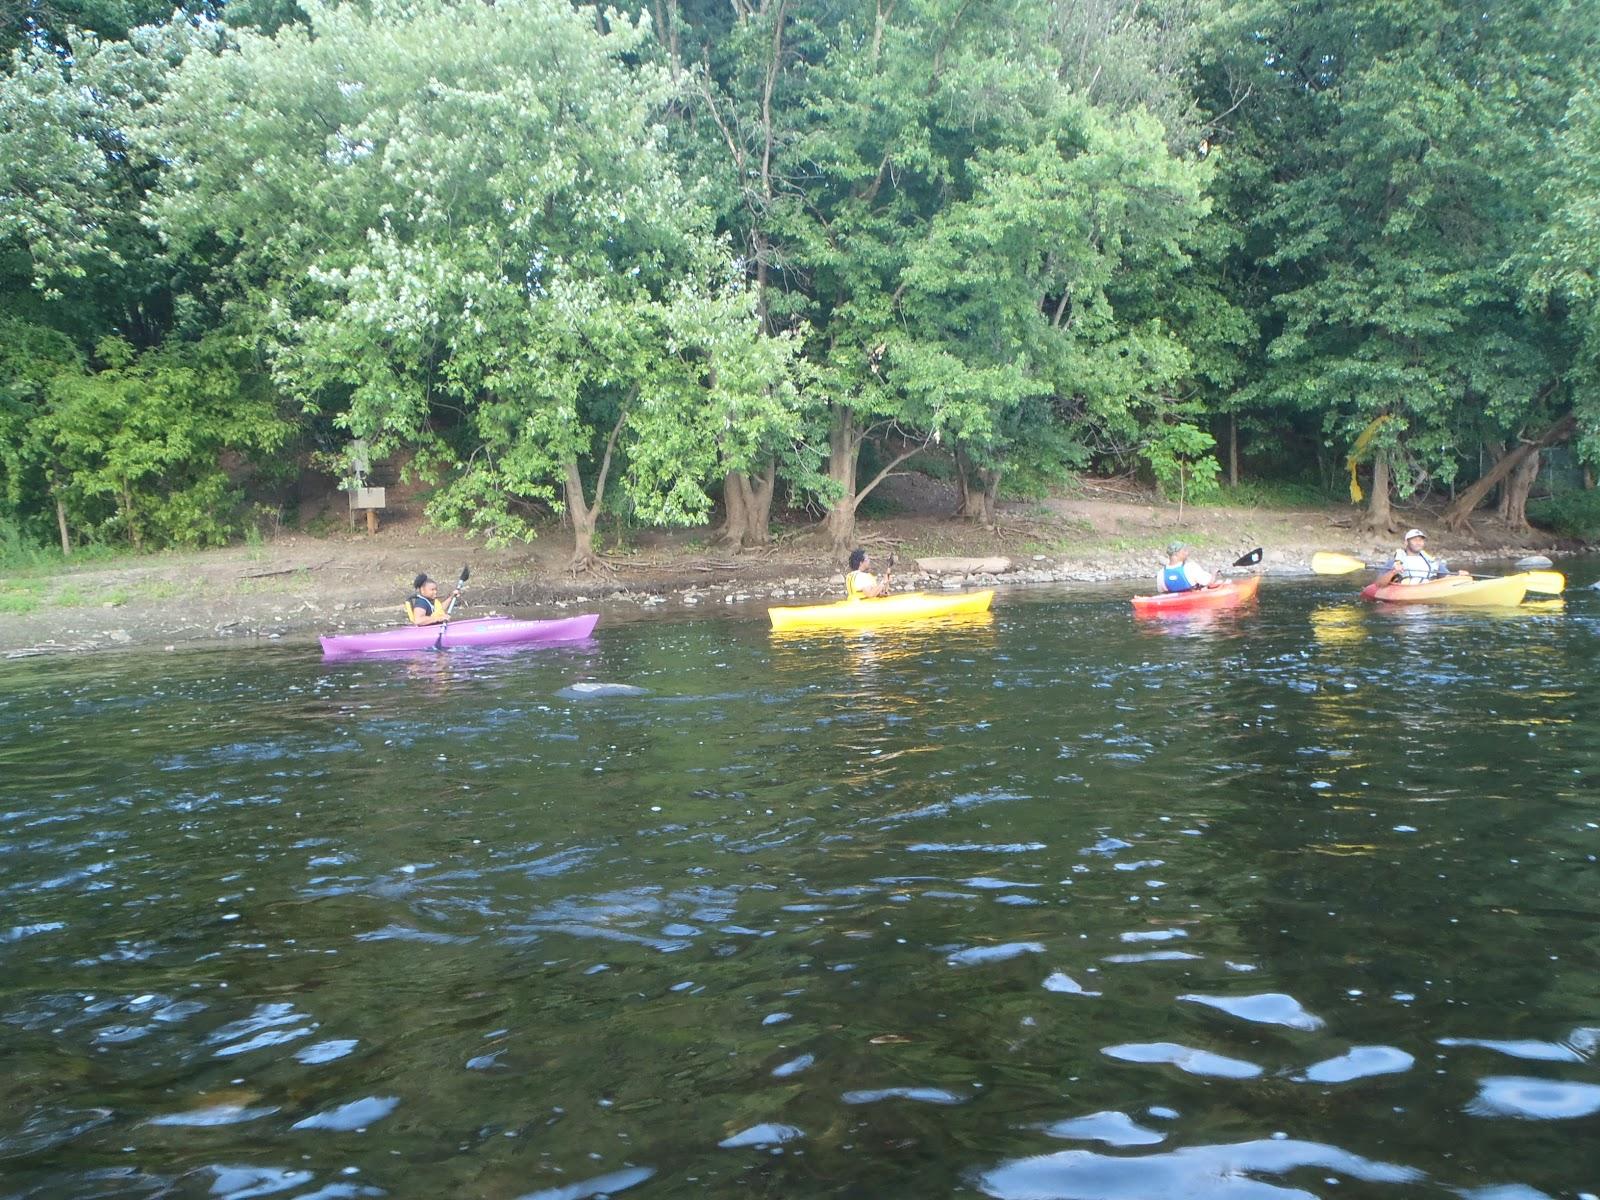 John 39 s kayak passaic river paddle for Passaic river fishing